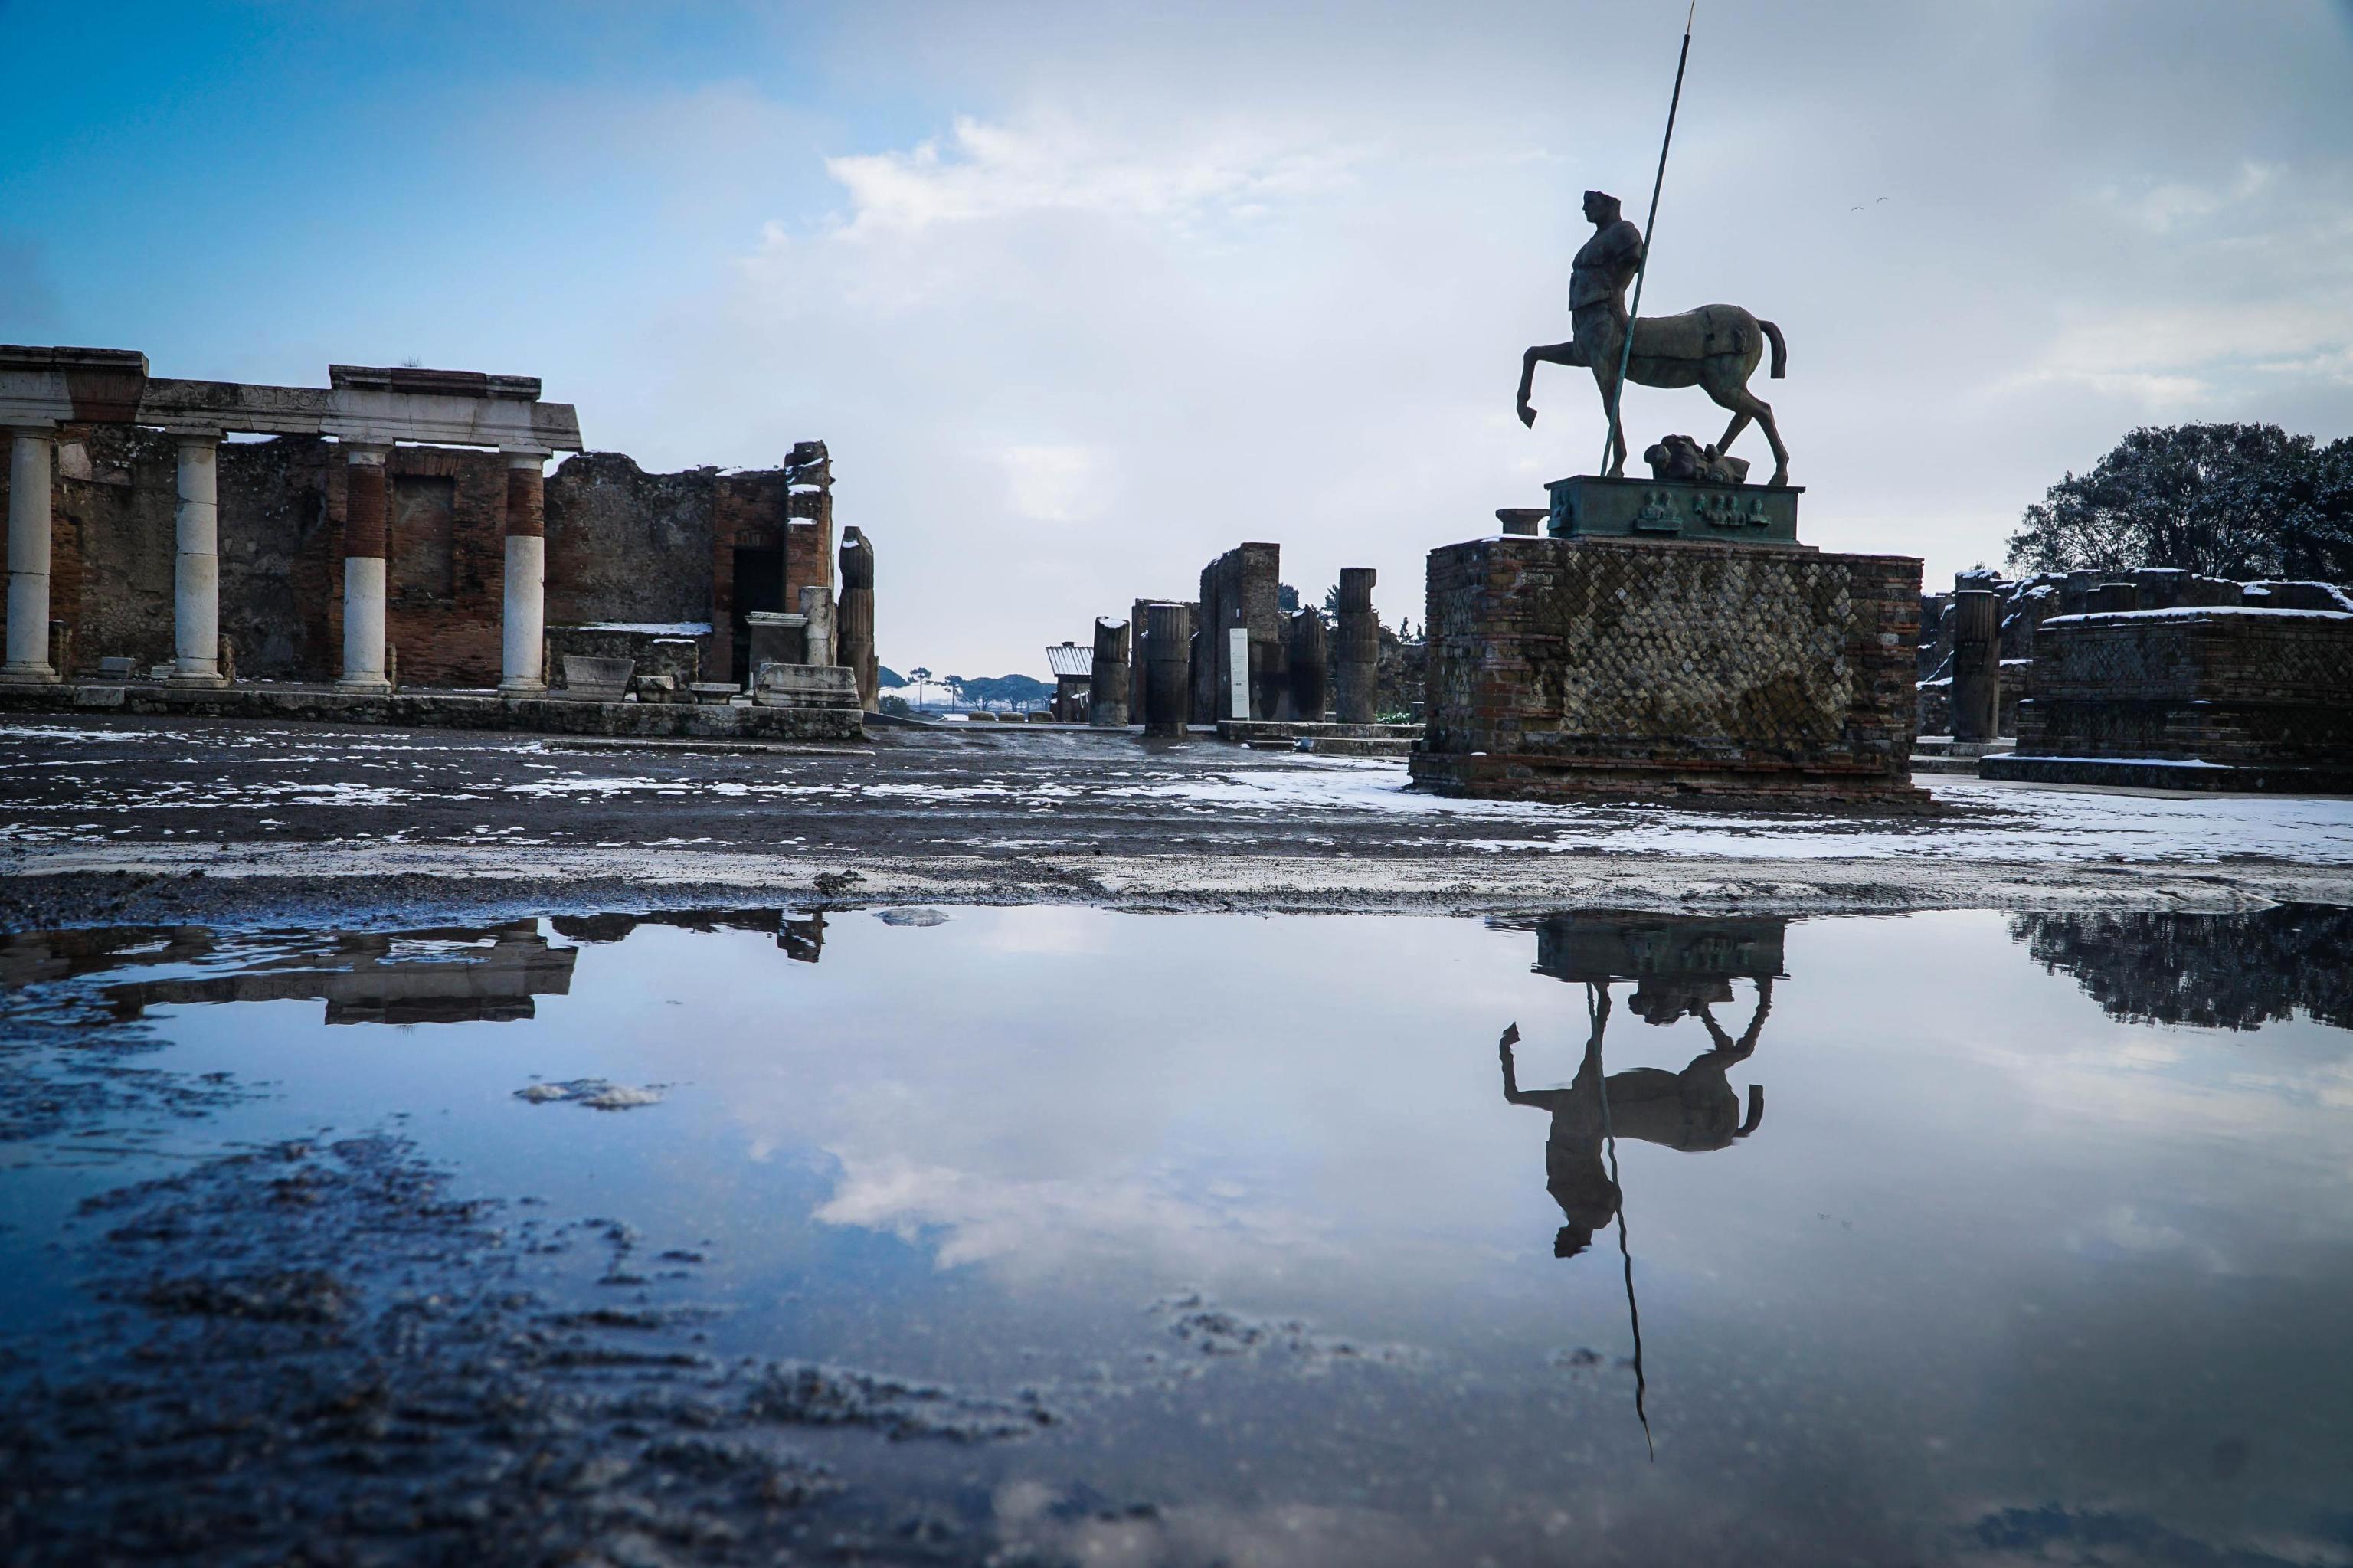 Las ruinas de Pompeya(Cesare Abbate/ANSA via AP)